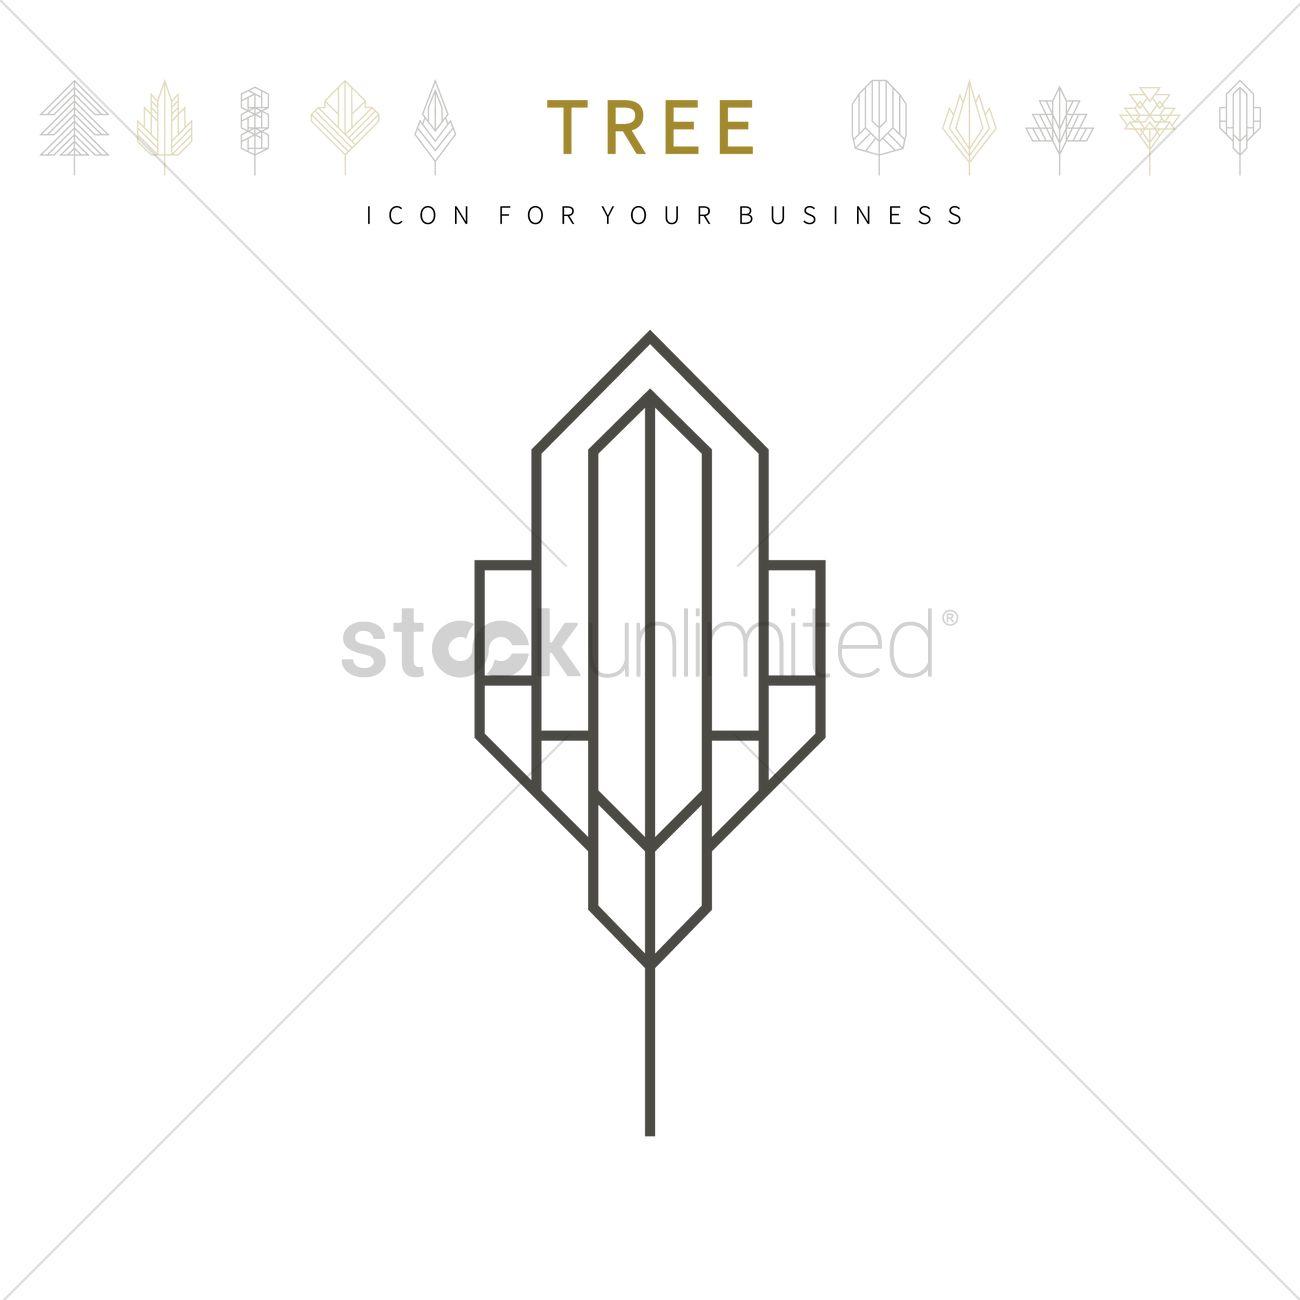 Tree template design vector image 1979903 stockunlimited tree template design vector graphic cheaphphosting Gallery